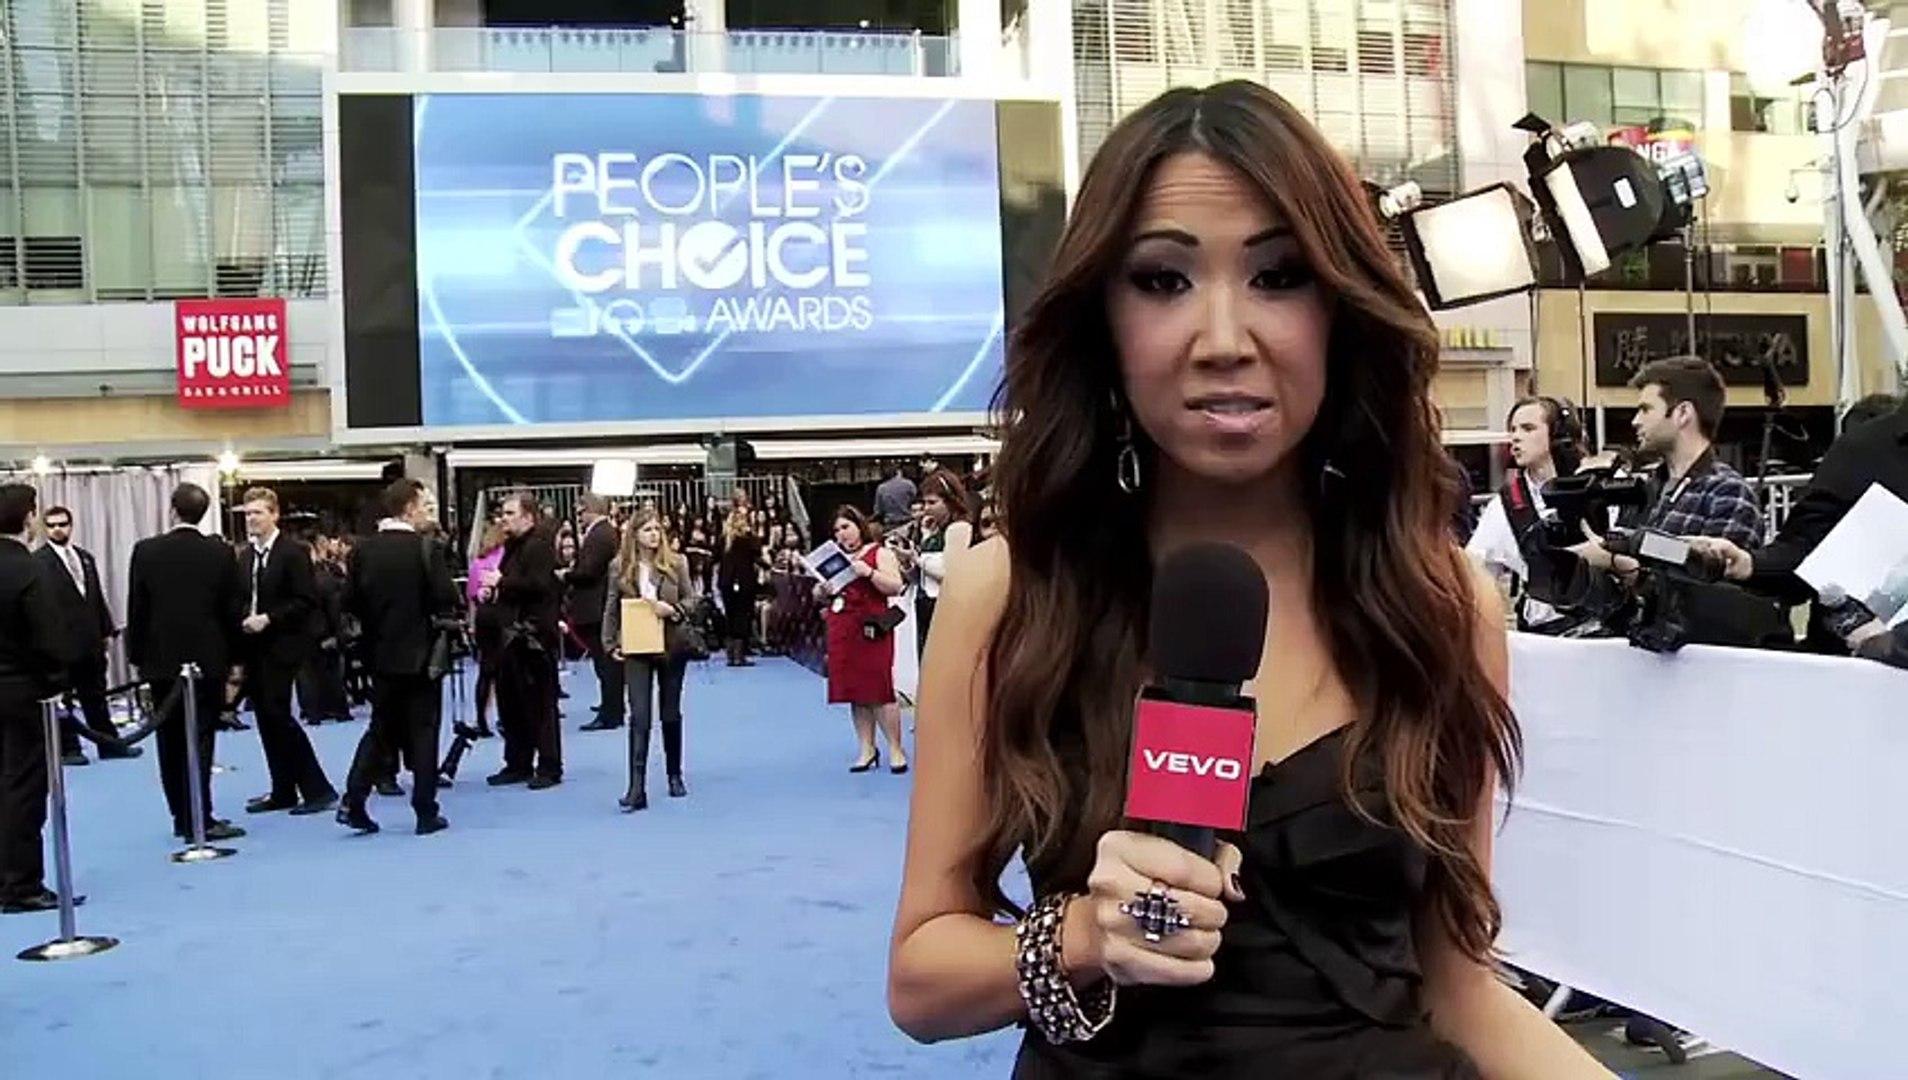 VEVO - VEVO News  People's Choice Awards 2011